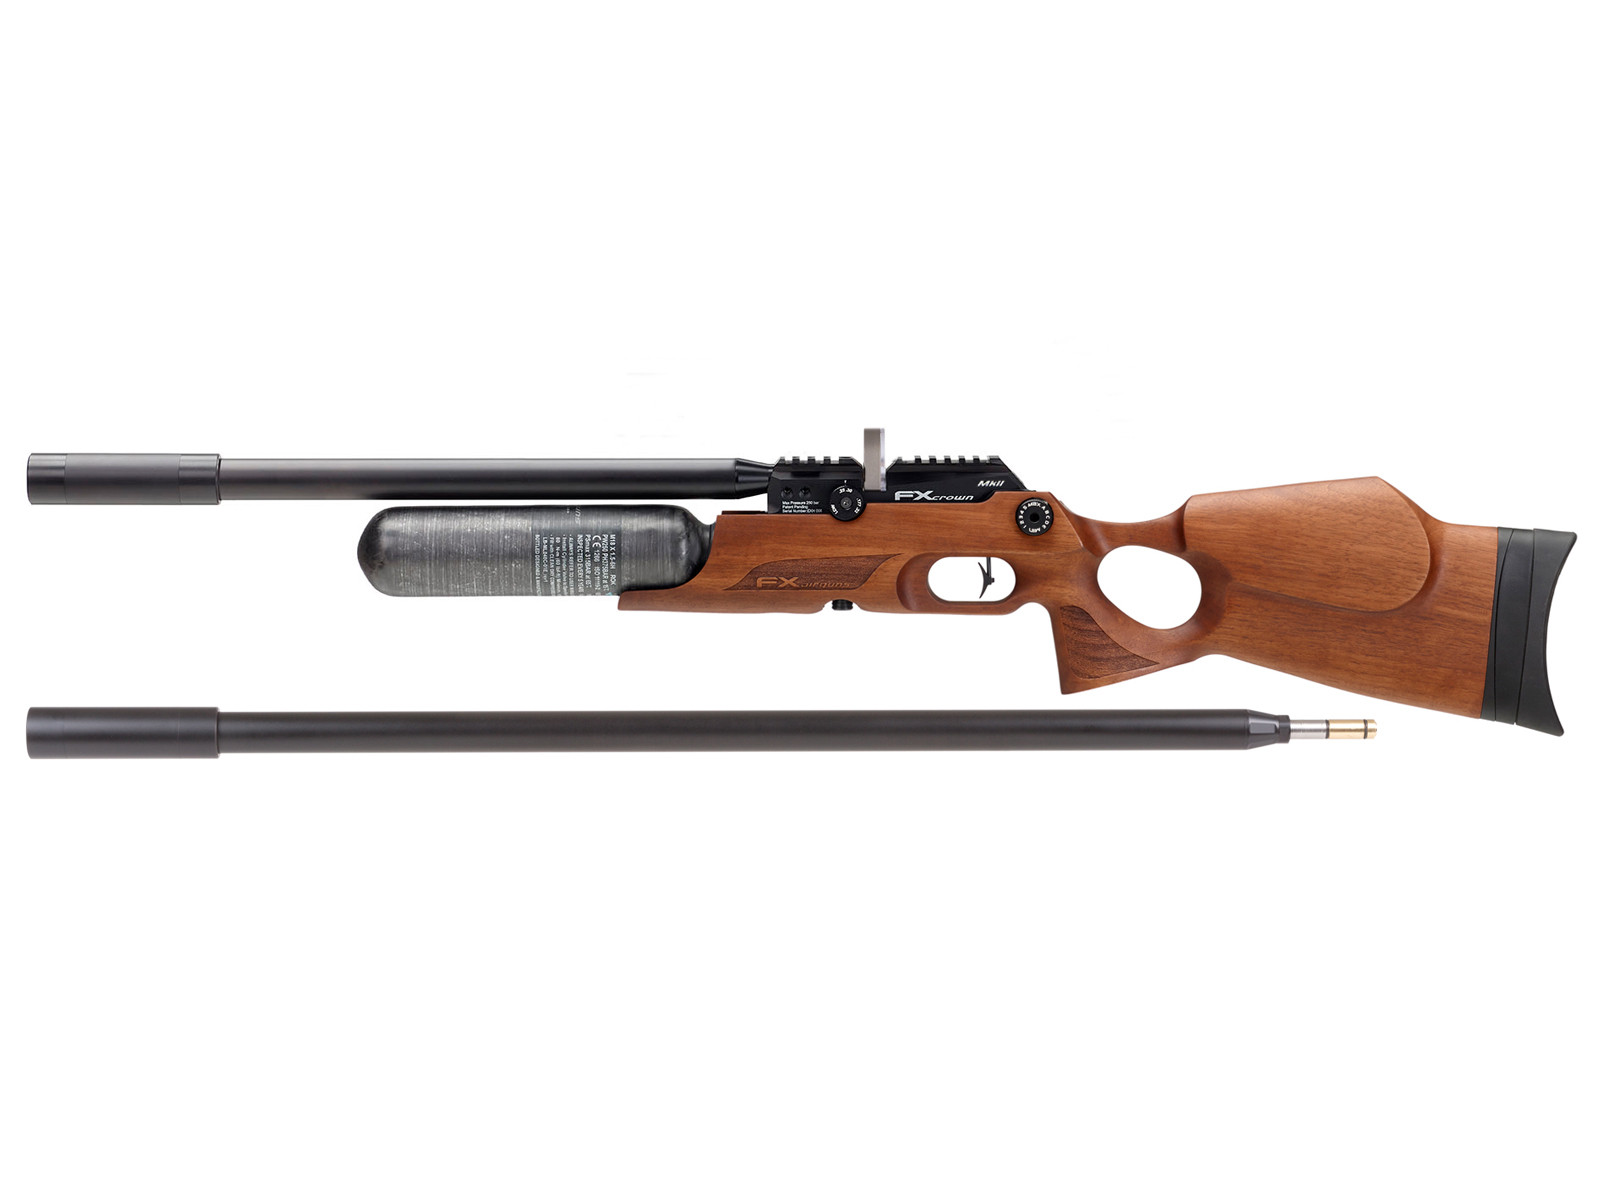 FX Crown Continuum MkII PCP Rifle, Walnut Stock